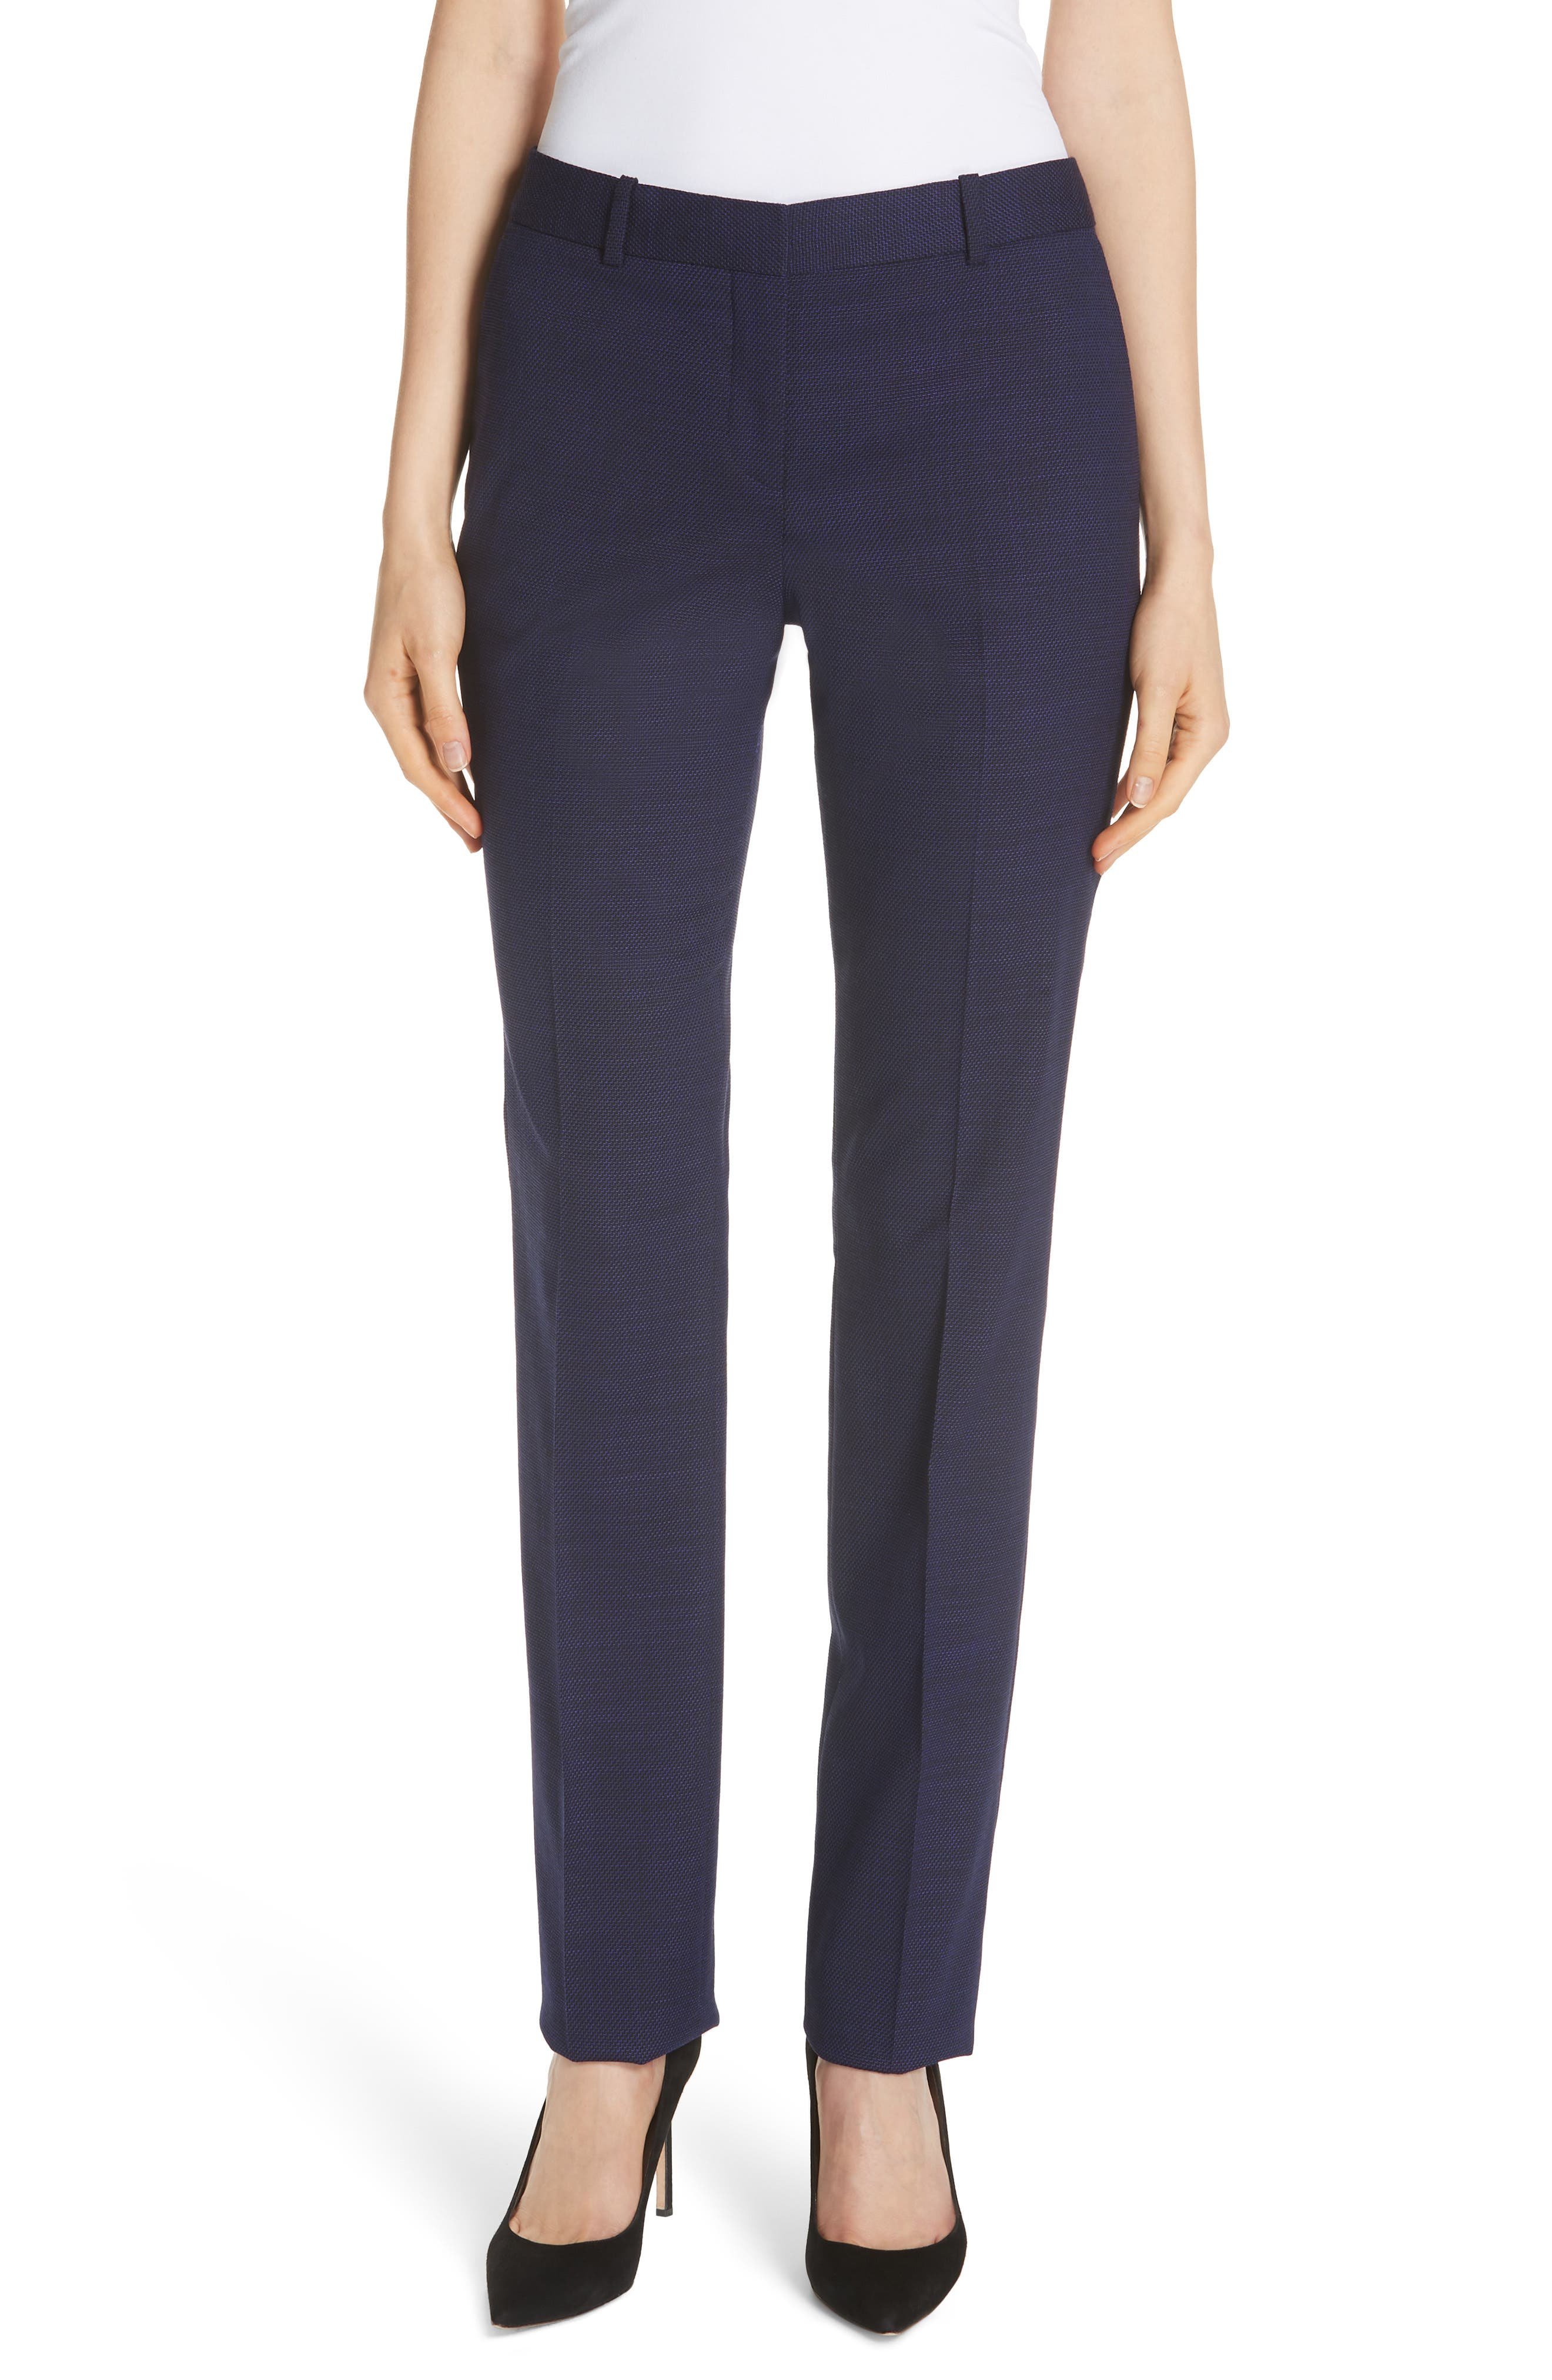 Titana Mini Glencheck Straight Leg Suit Pants,                         Main,                         color, Deep Lilac Fantasy